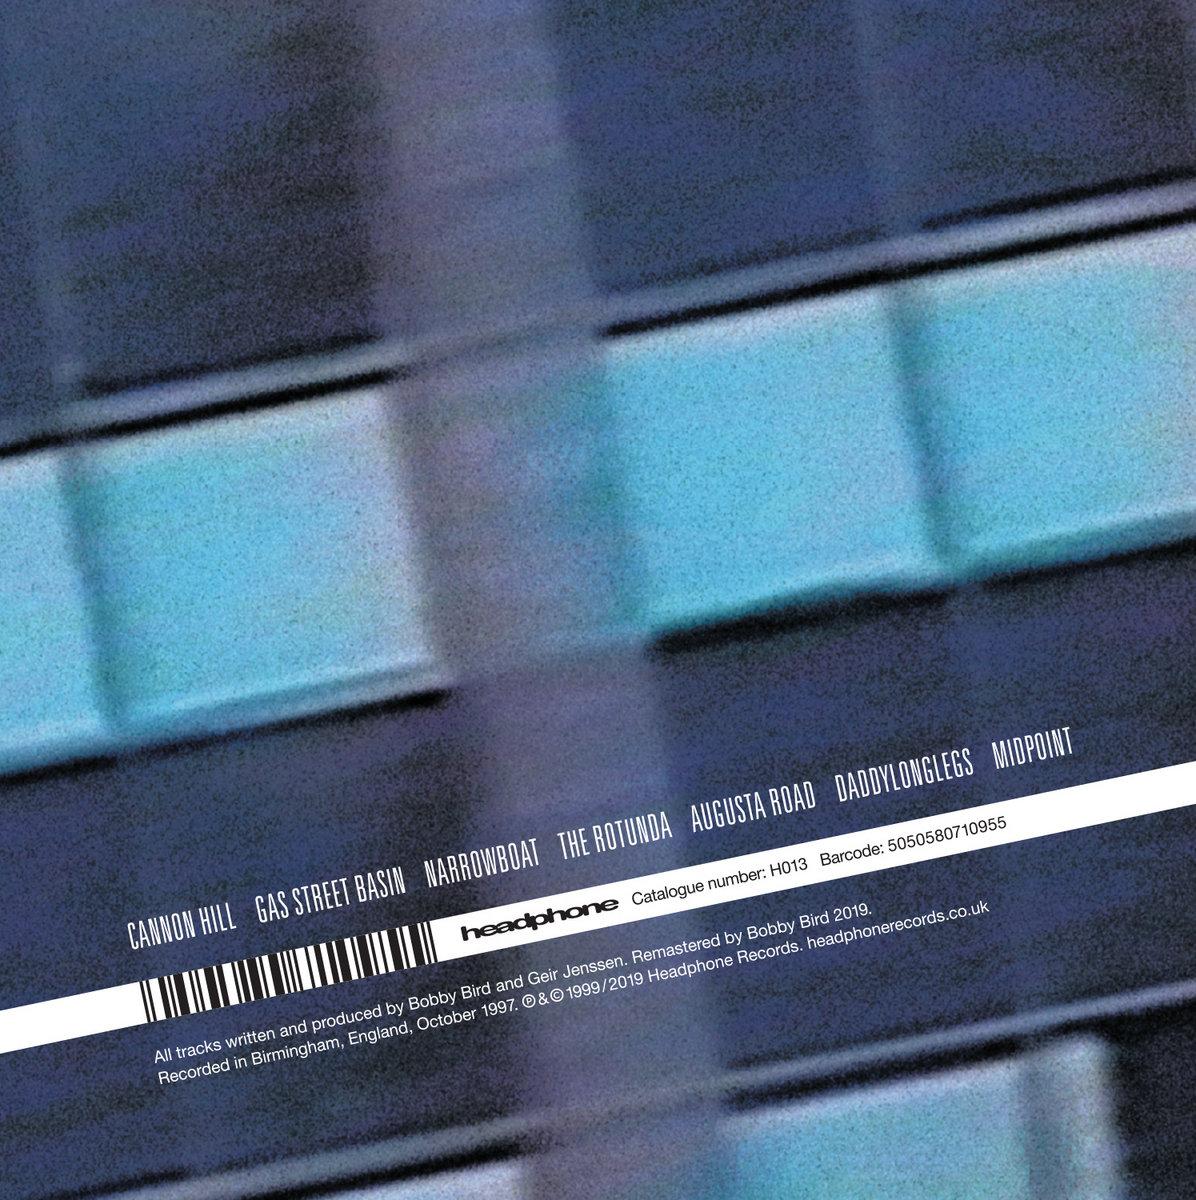 Birmingham Frequencies (remastered) | Higher Intelligence Agency